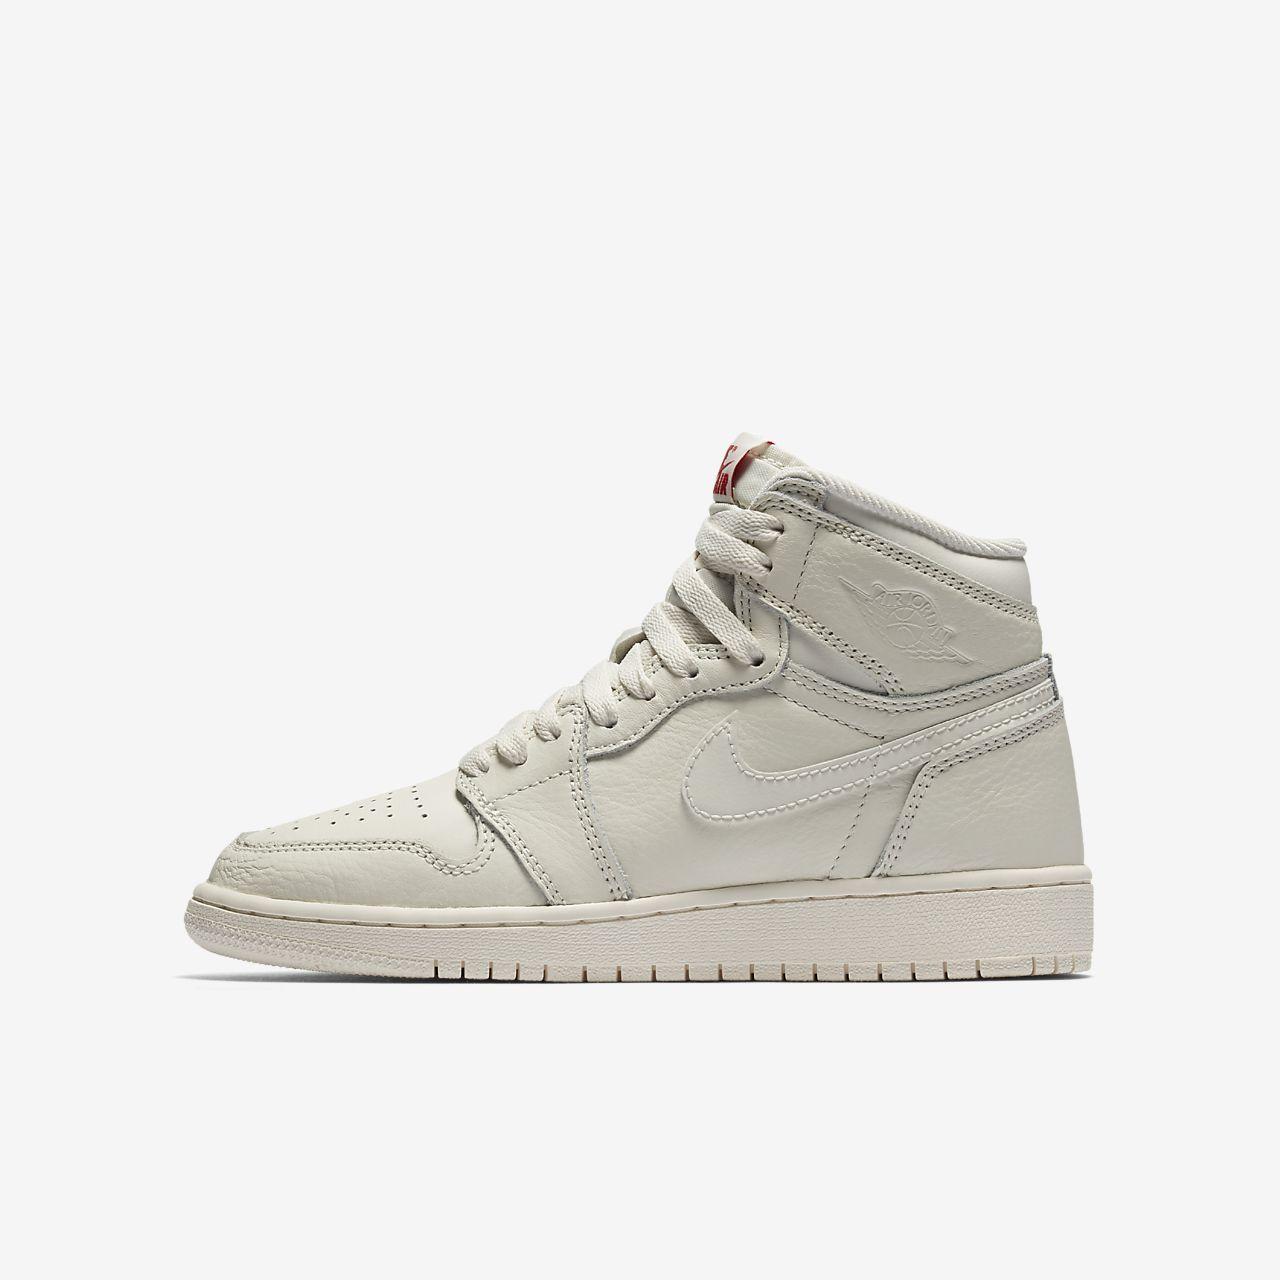 kids jordan 1 shoes